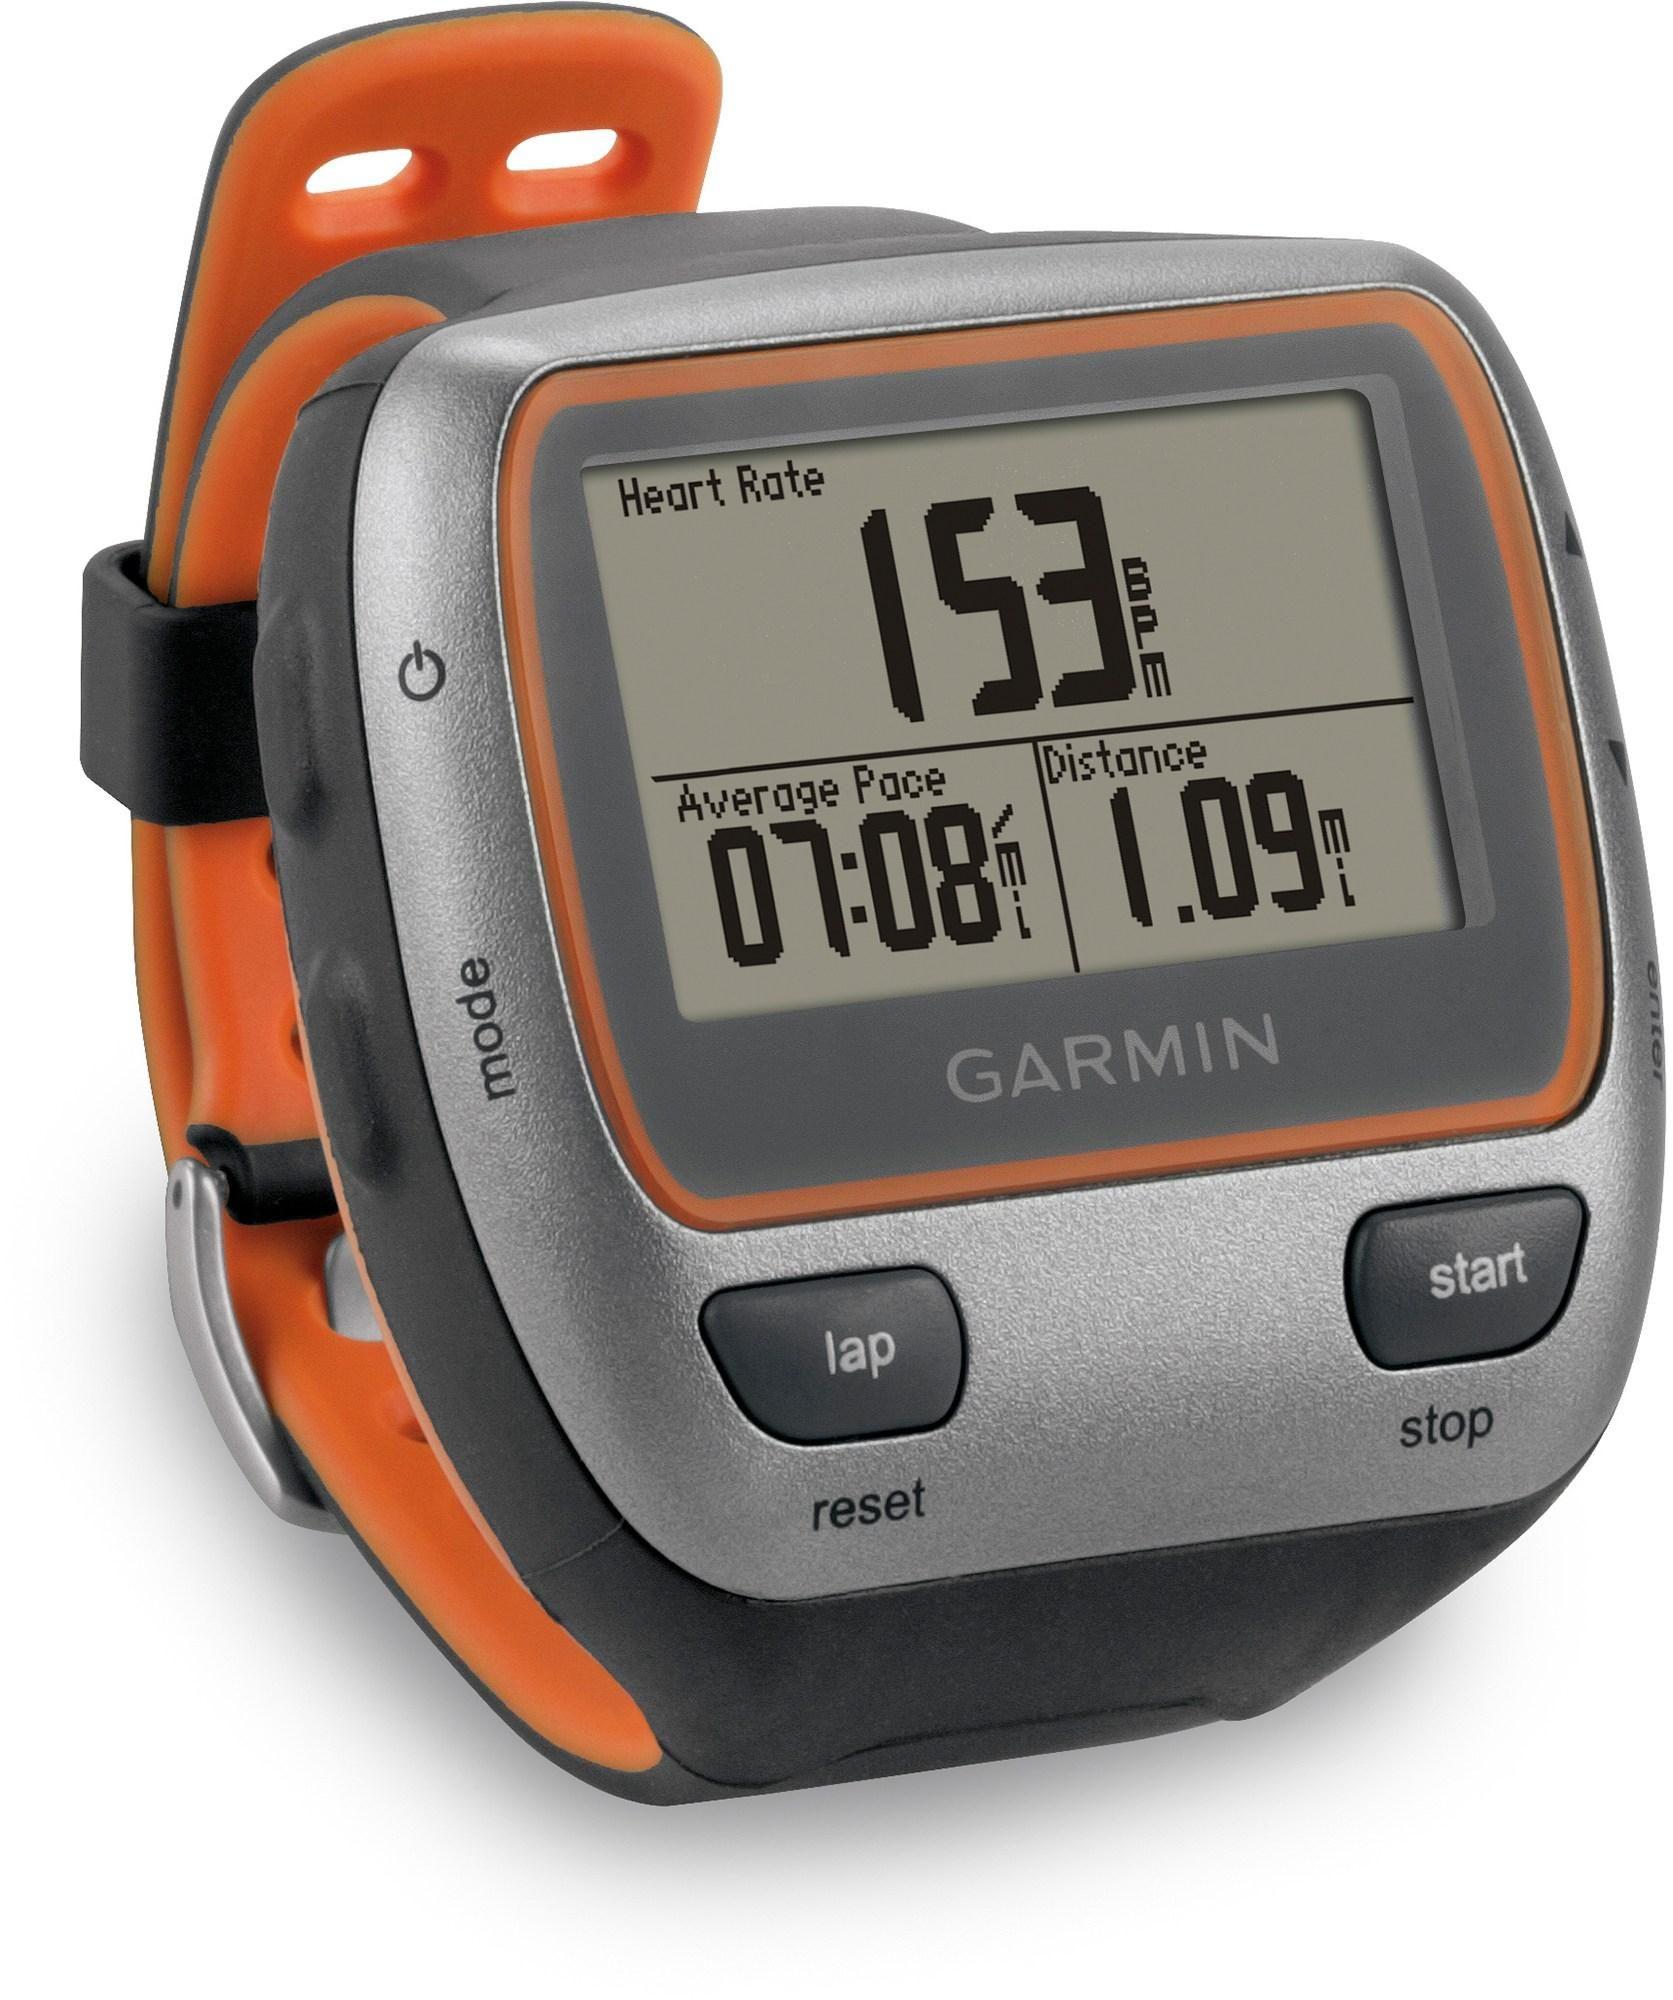 He Loves Gadgets — Garmin Forerunner 310XT GPS Fitness Monitor